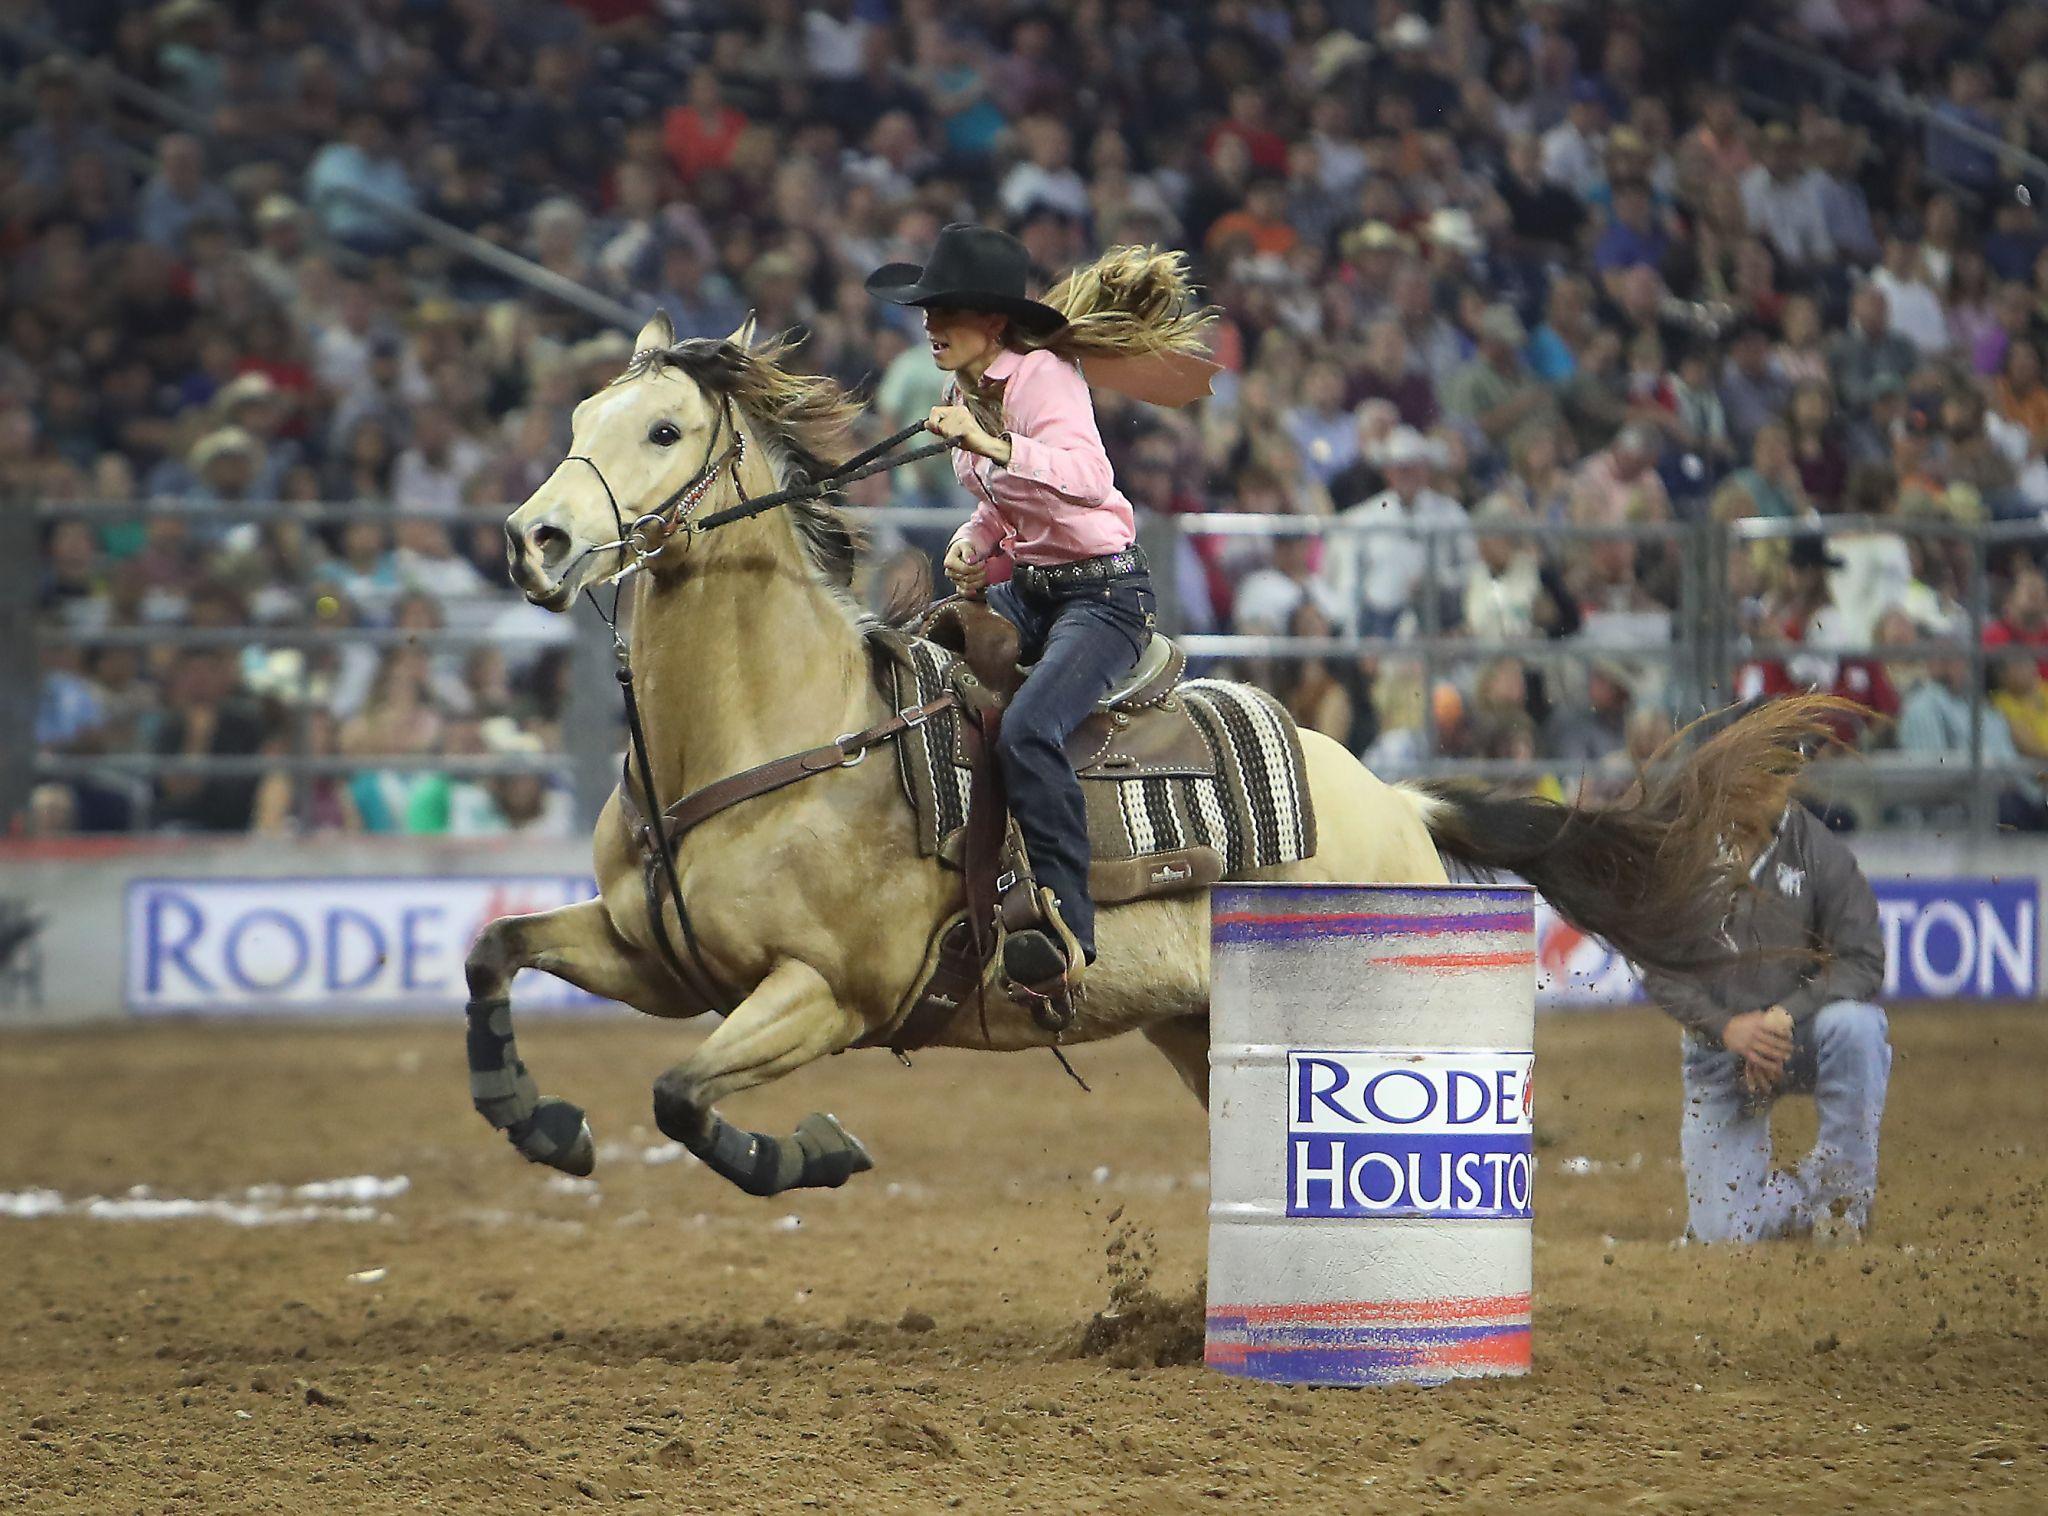 Kassie Mowry dominates barrel racing at RodeoHouston